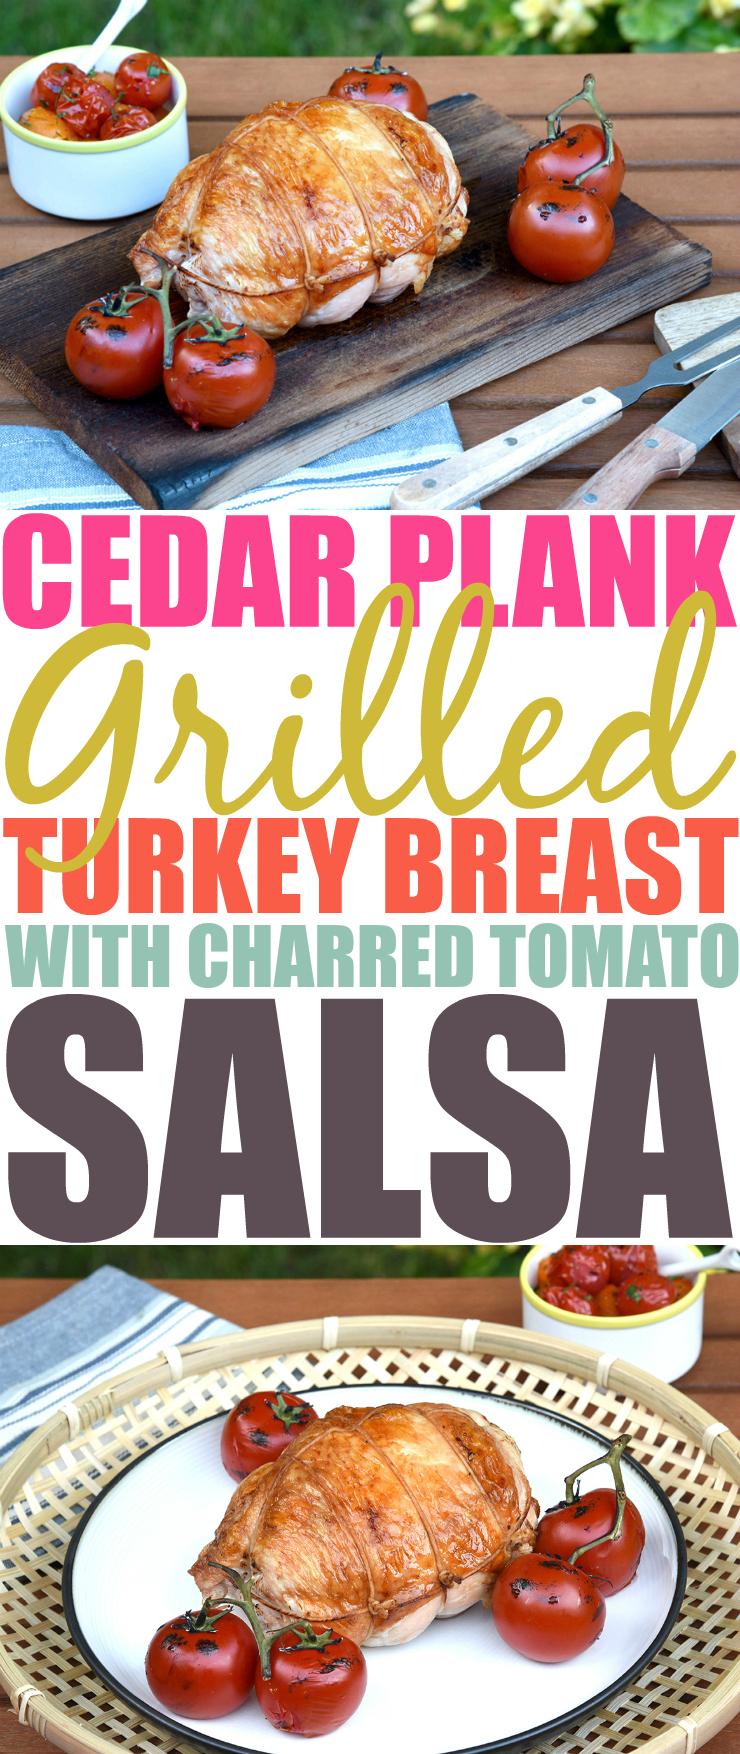 Cedar Plank Grilled Turkey Breast With Charred Tomato Salsa